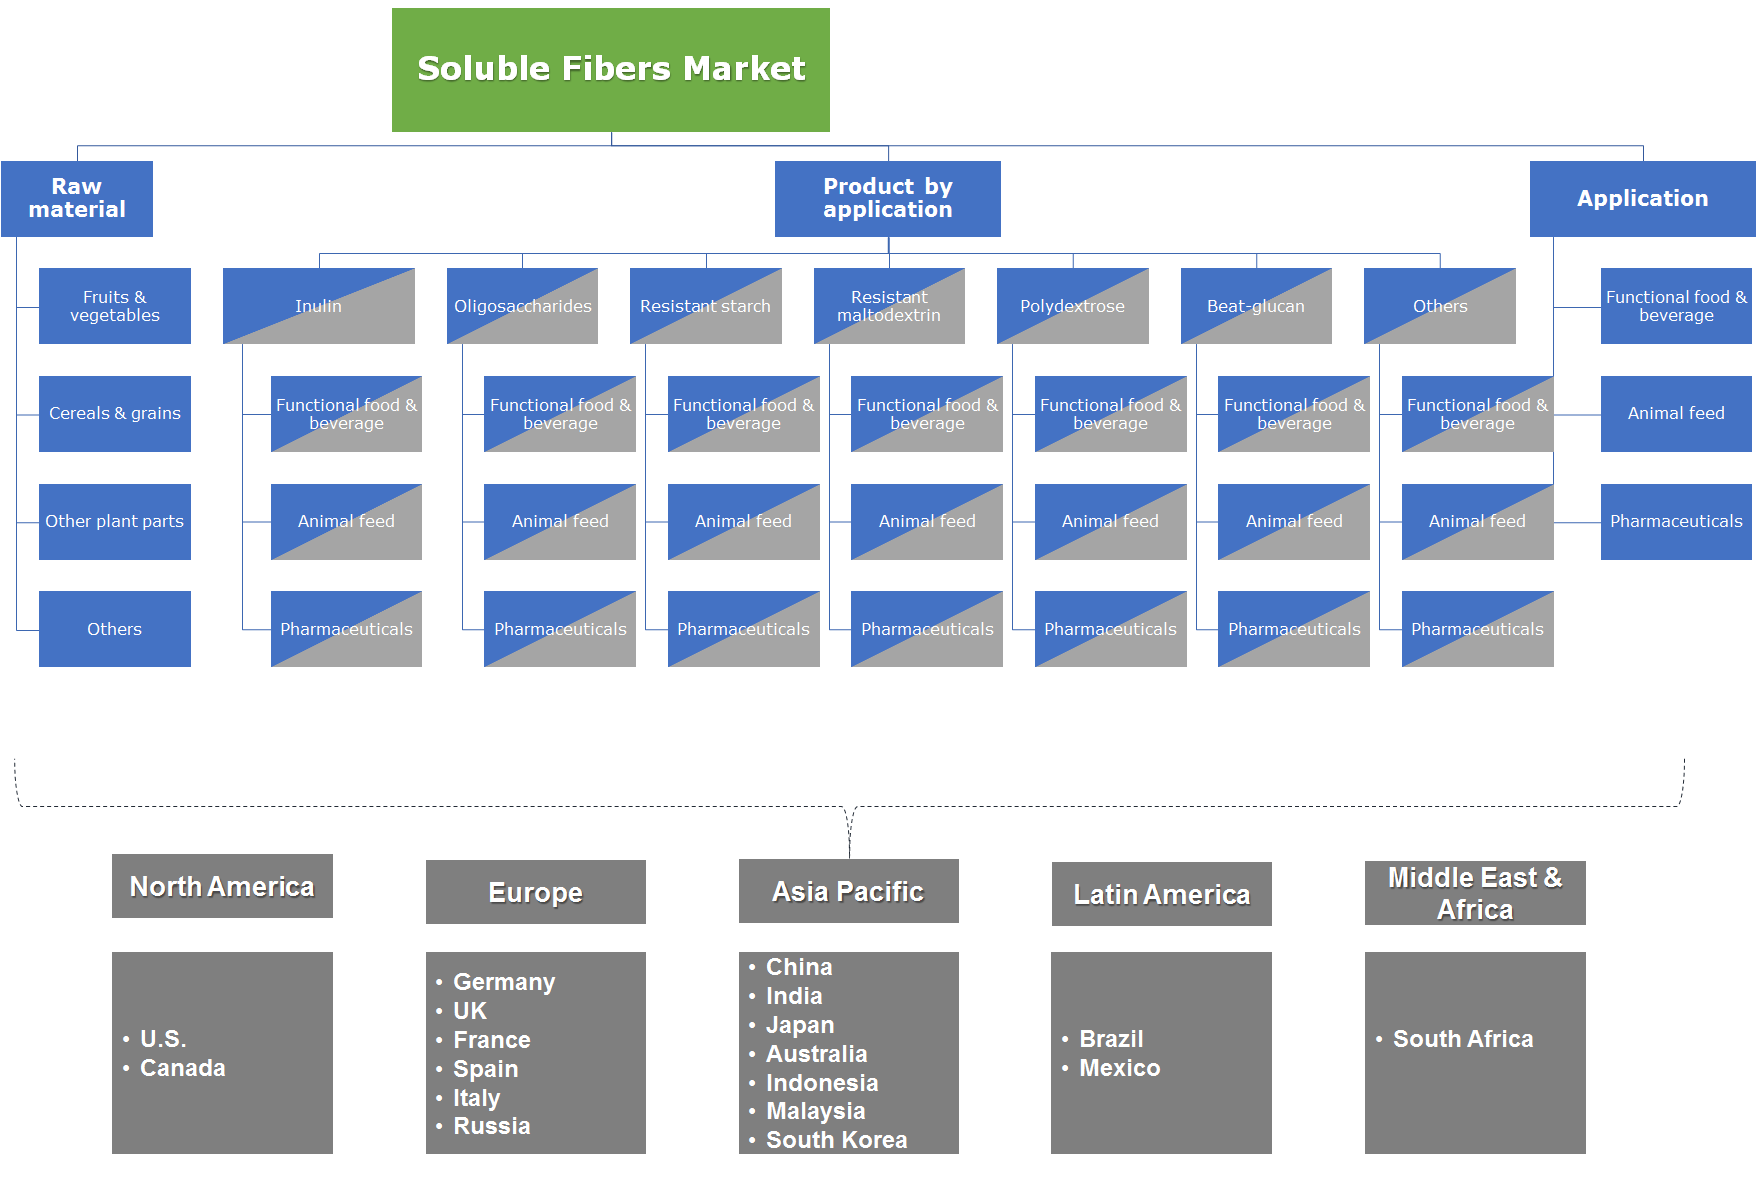 Soluble Fibers Market Segmentation